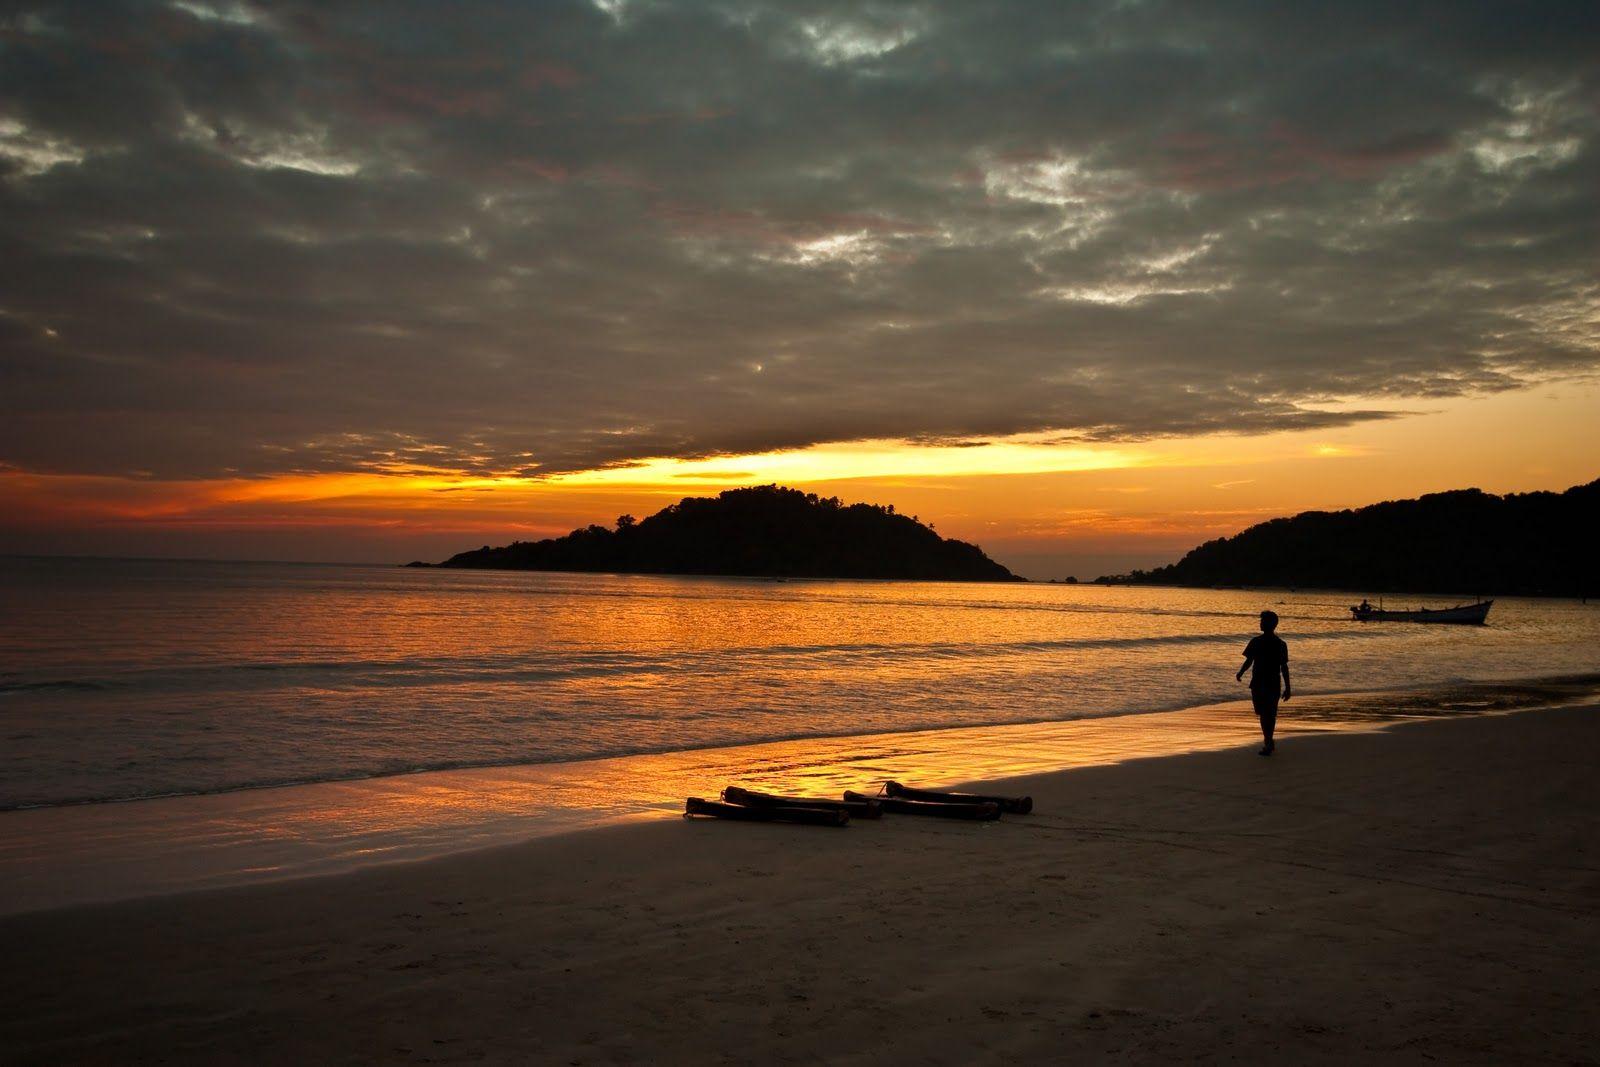 palolem-beach-sunset-goa (With images) | Beach sunset, India ...